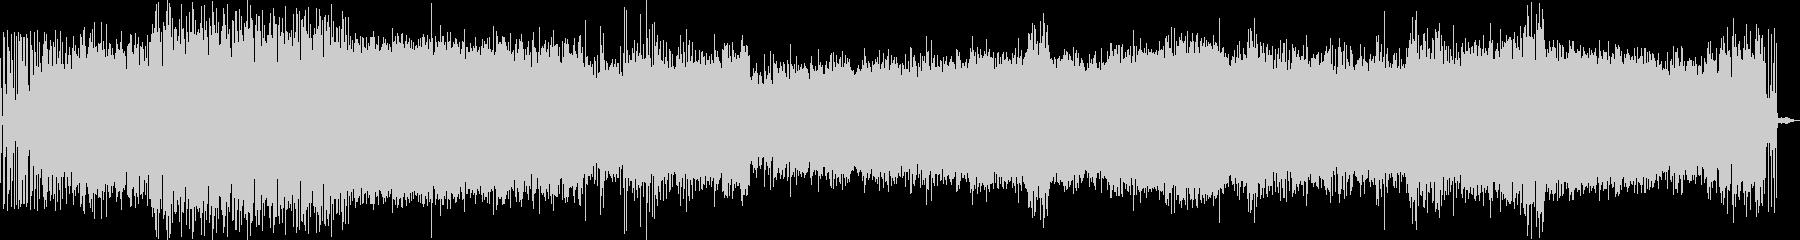 EDM グリッチサウンド の未再生の波形